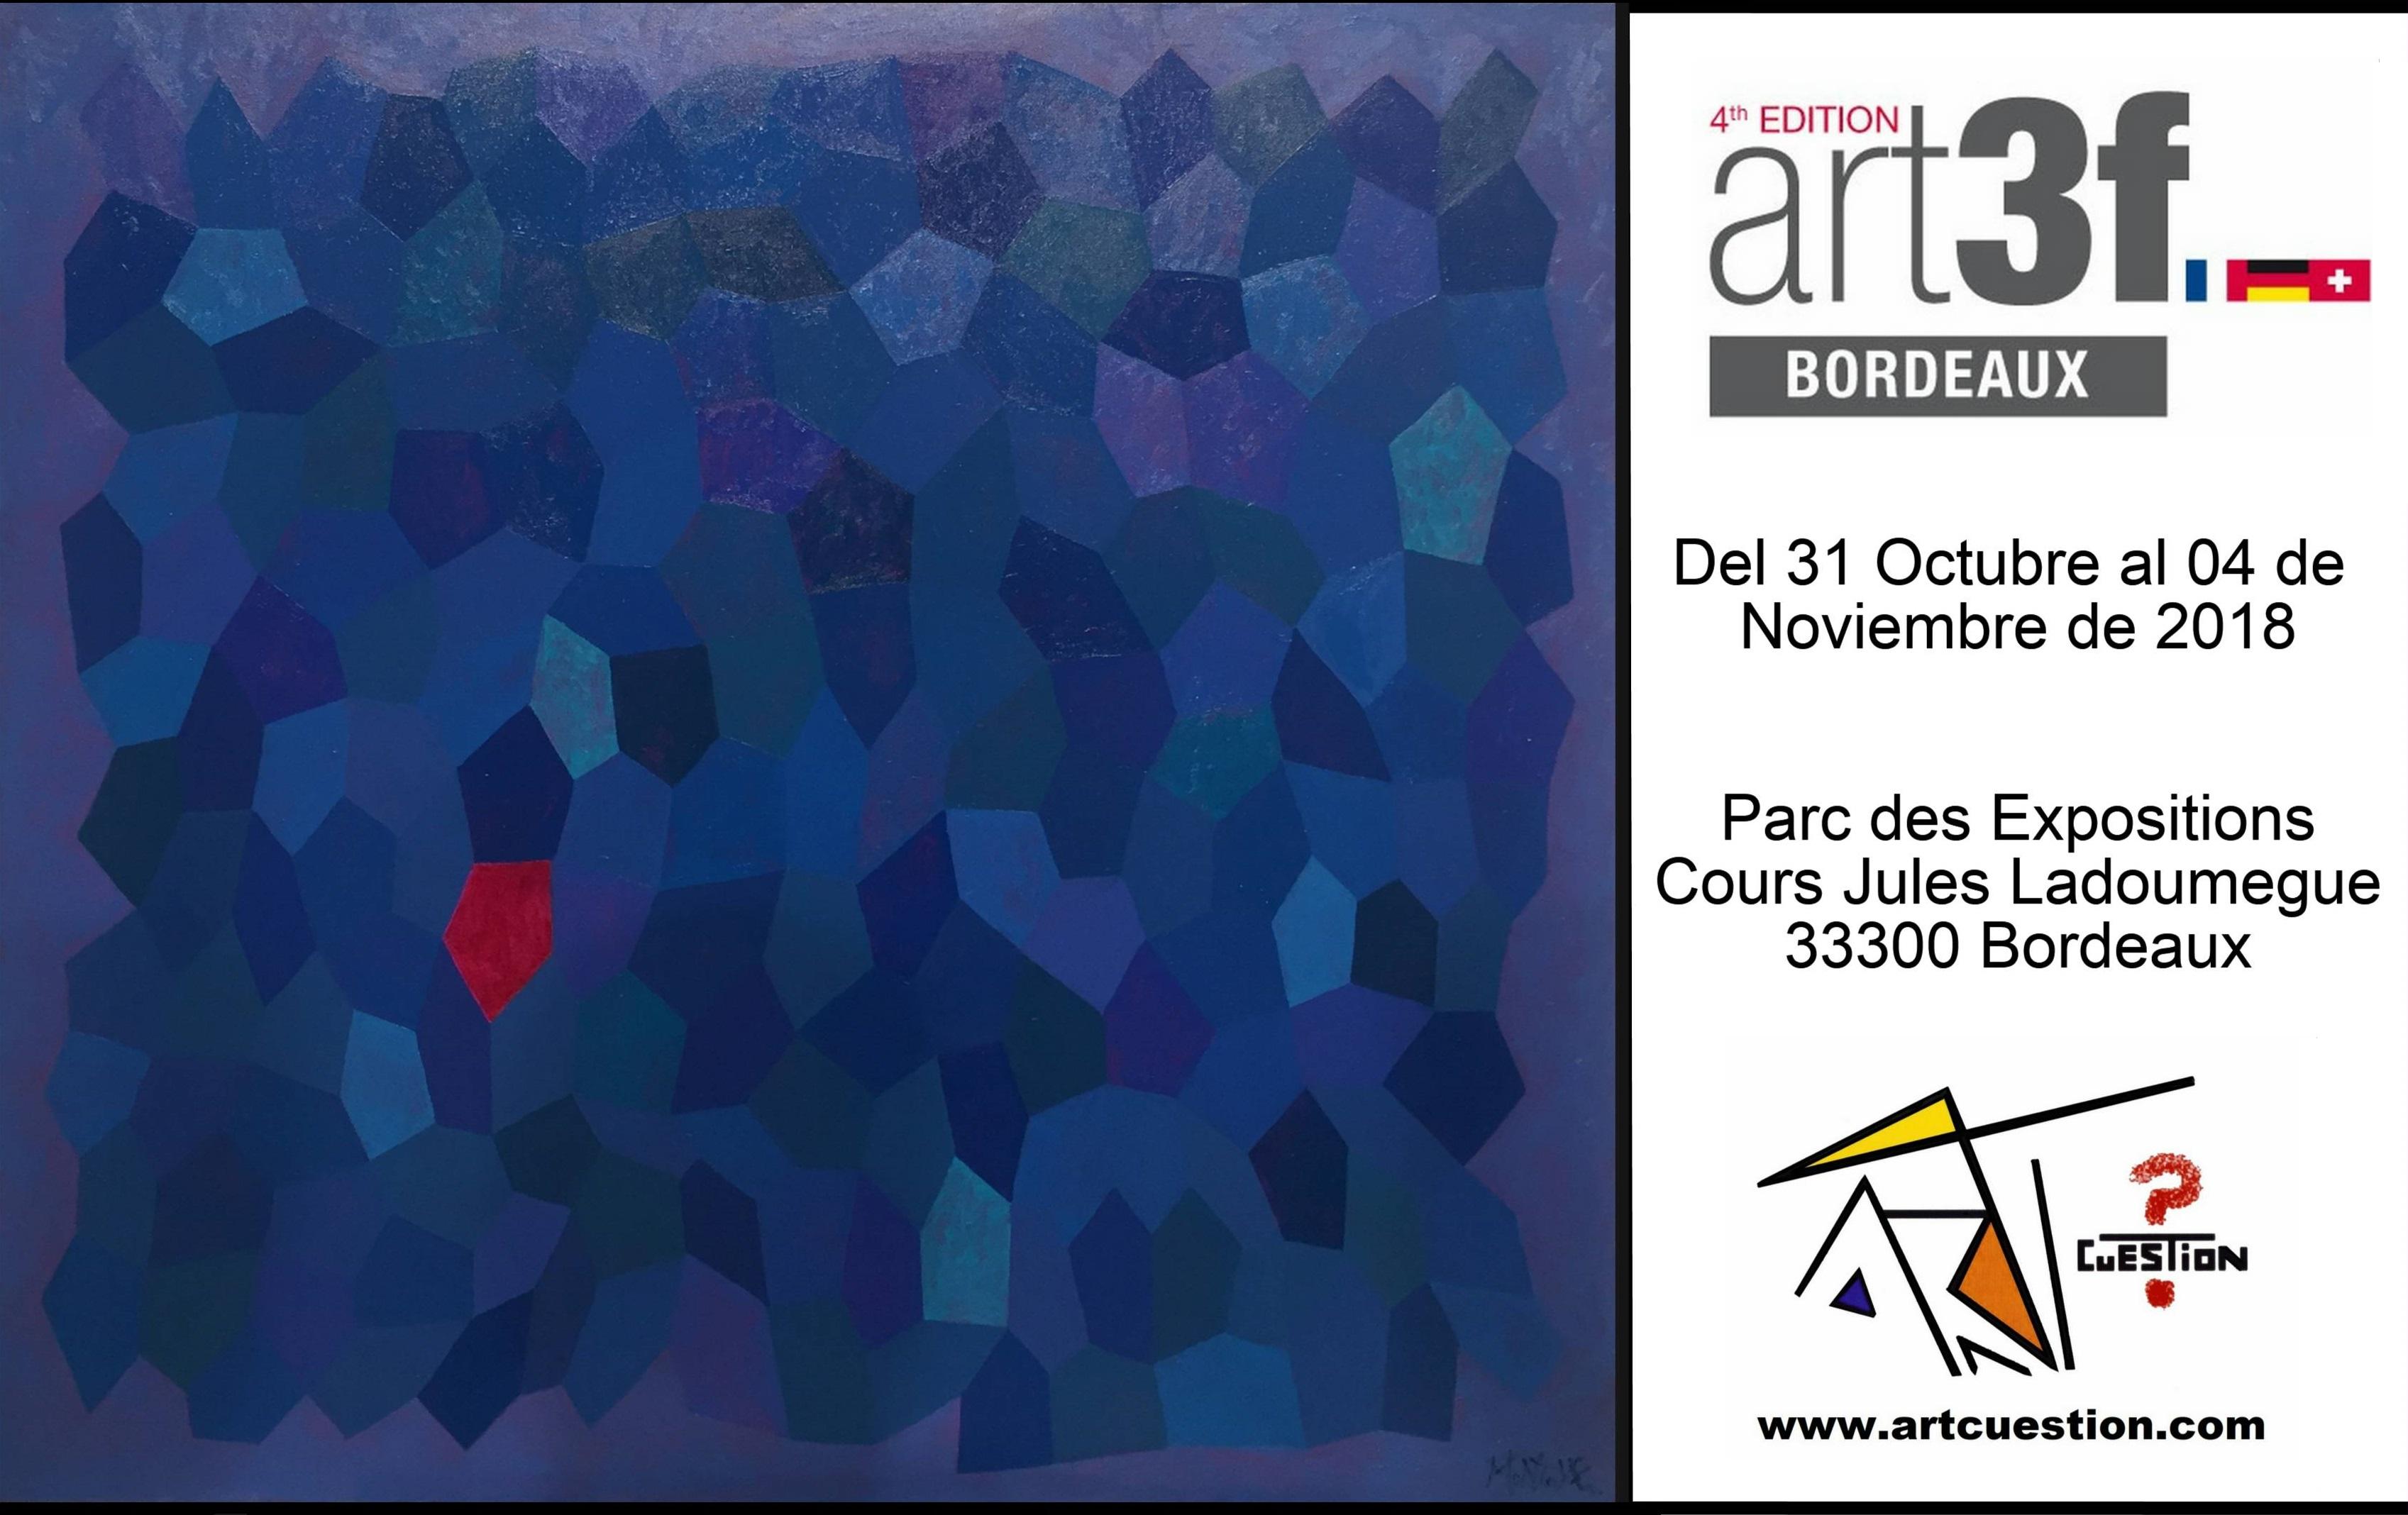 VIVONS ART. Feria de Arte de Burdeos